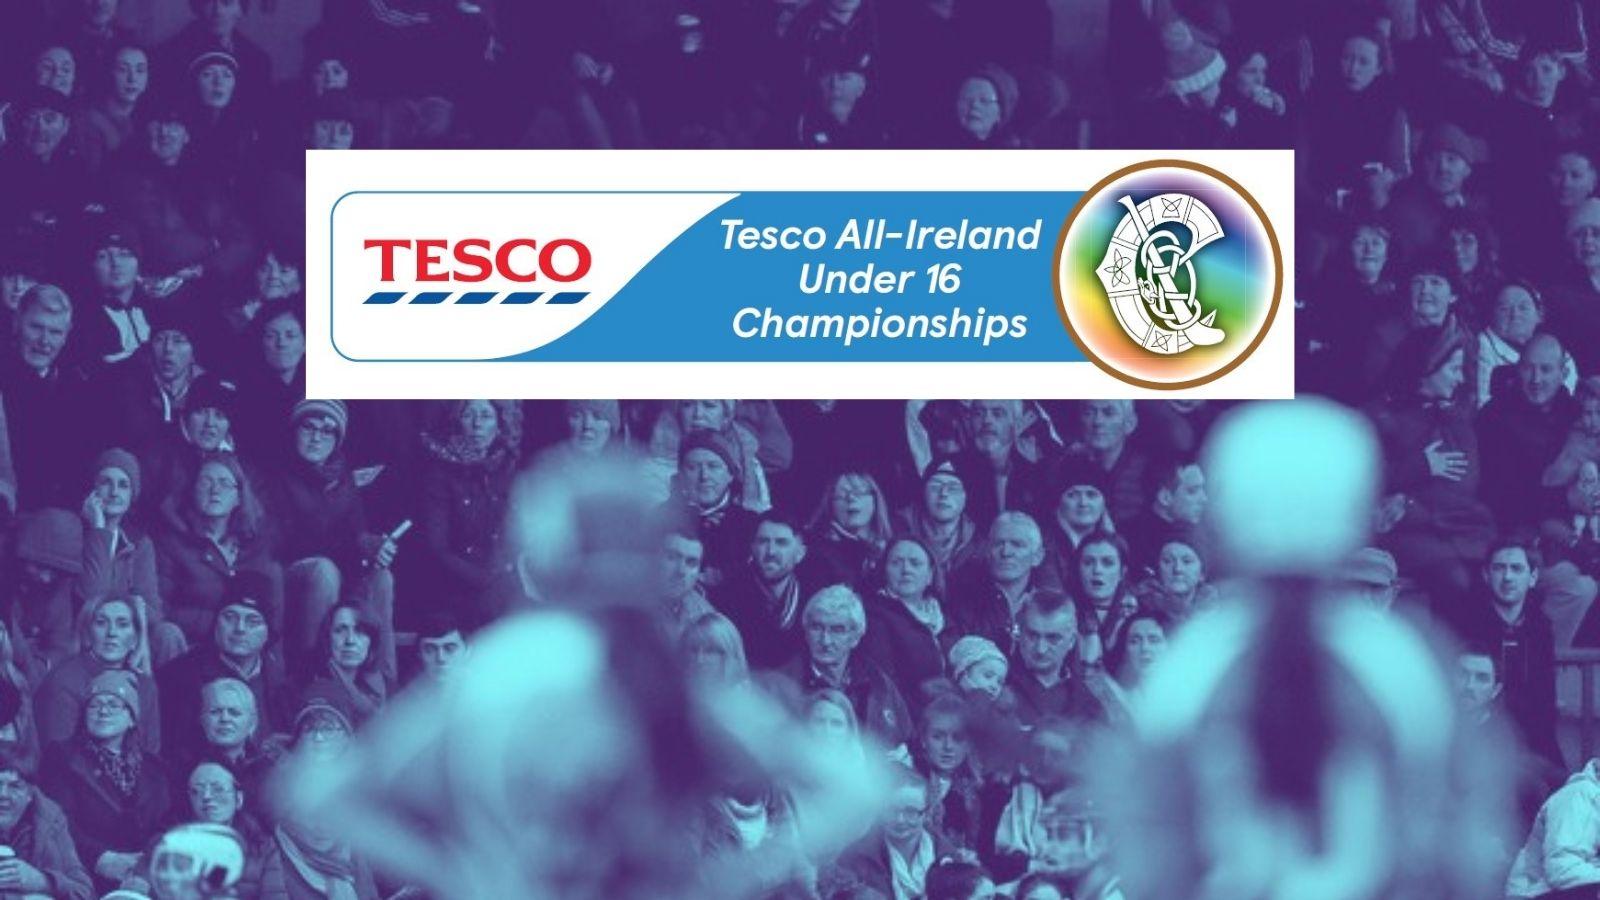 FIXTURES: Tesco U16 All-Ireland Championship 04.07.2021